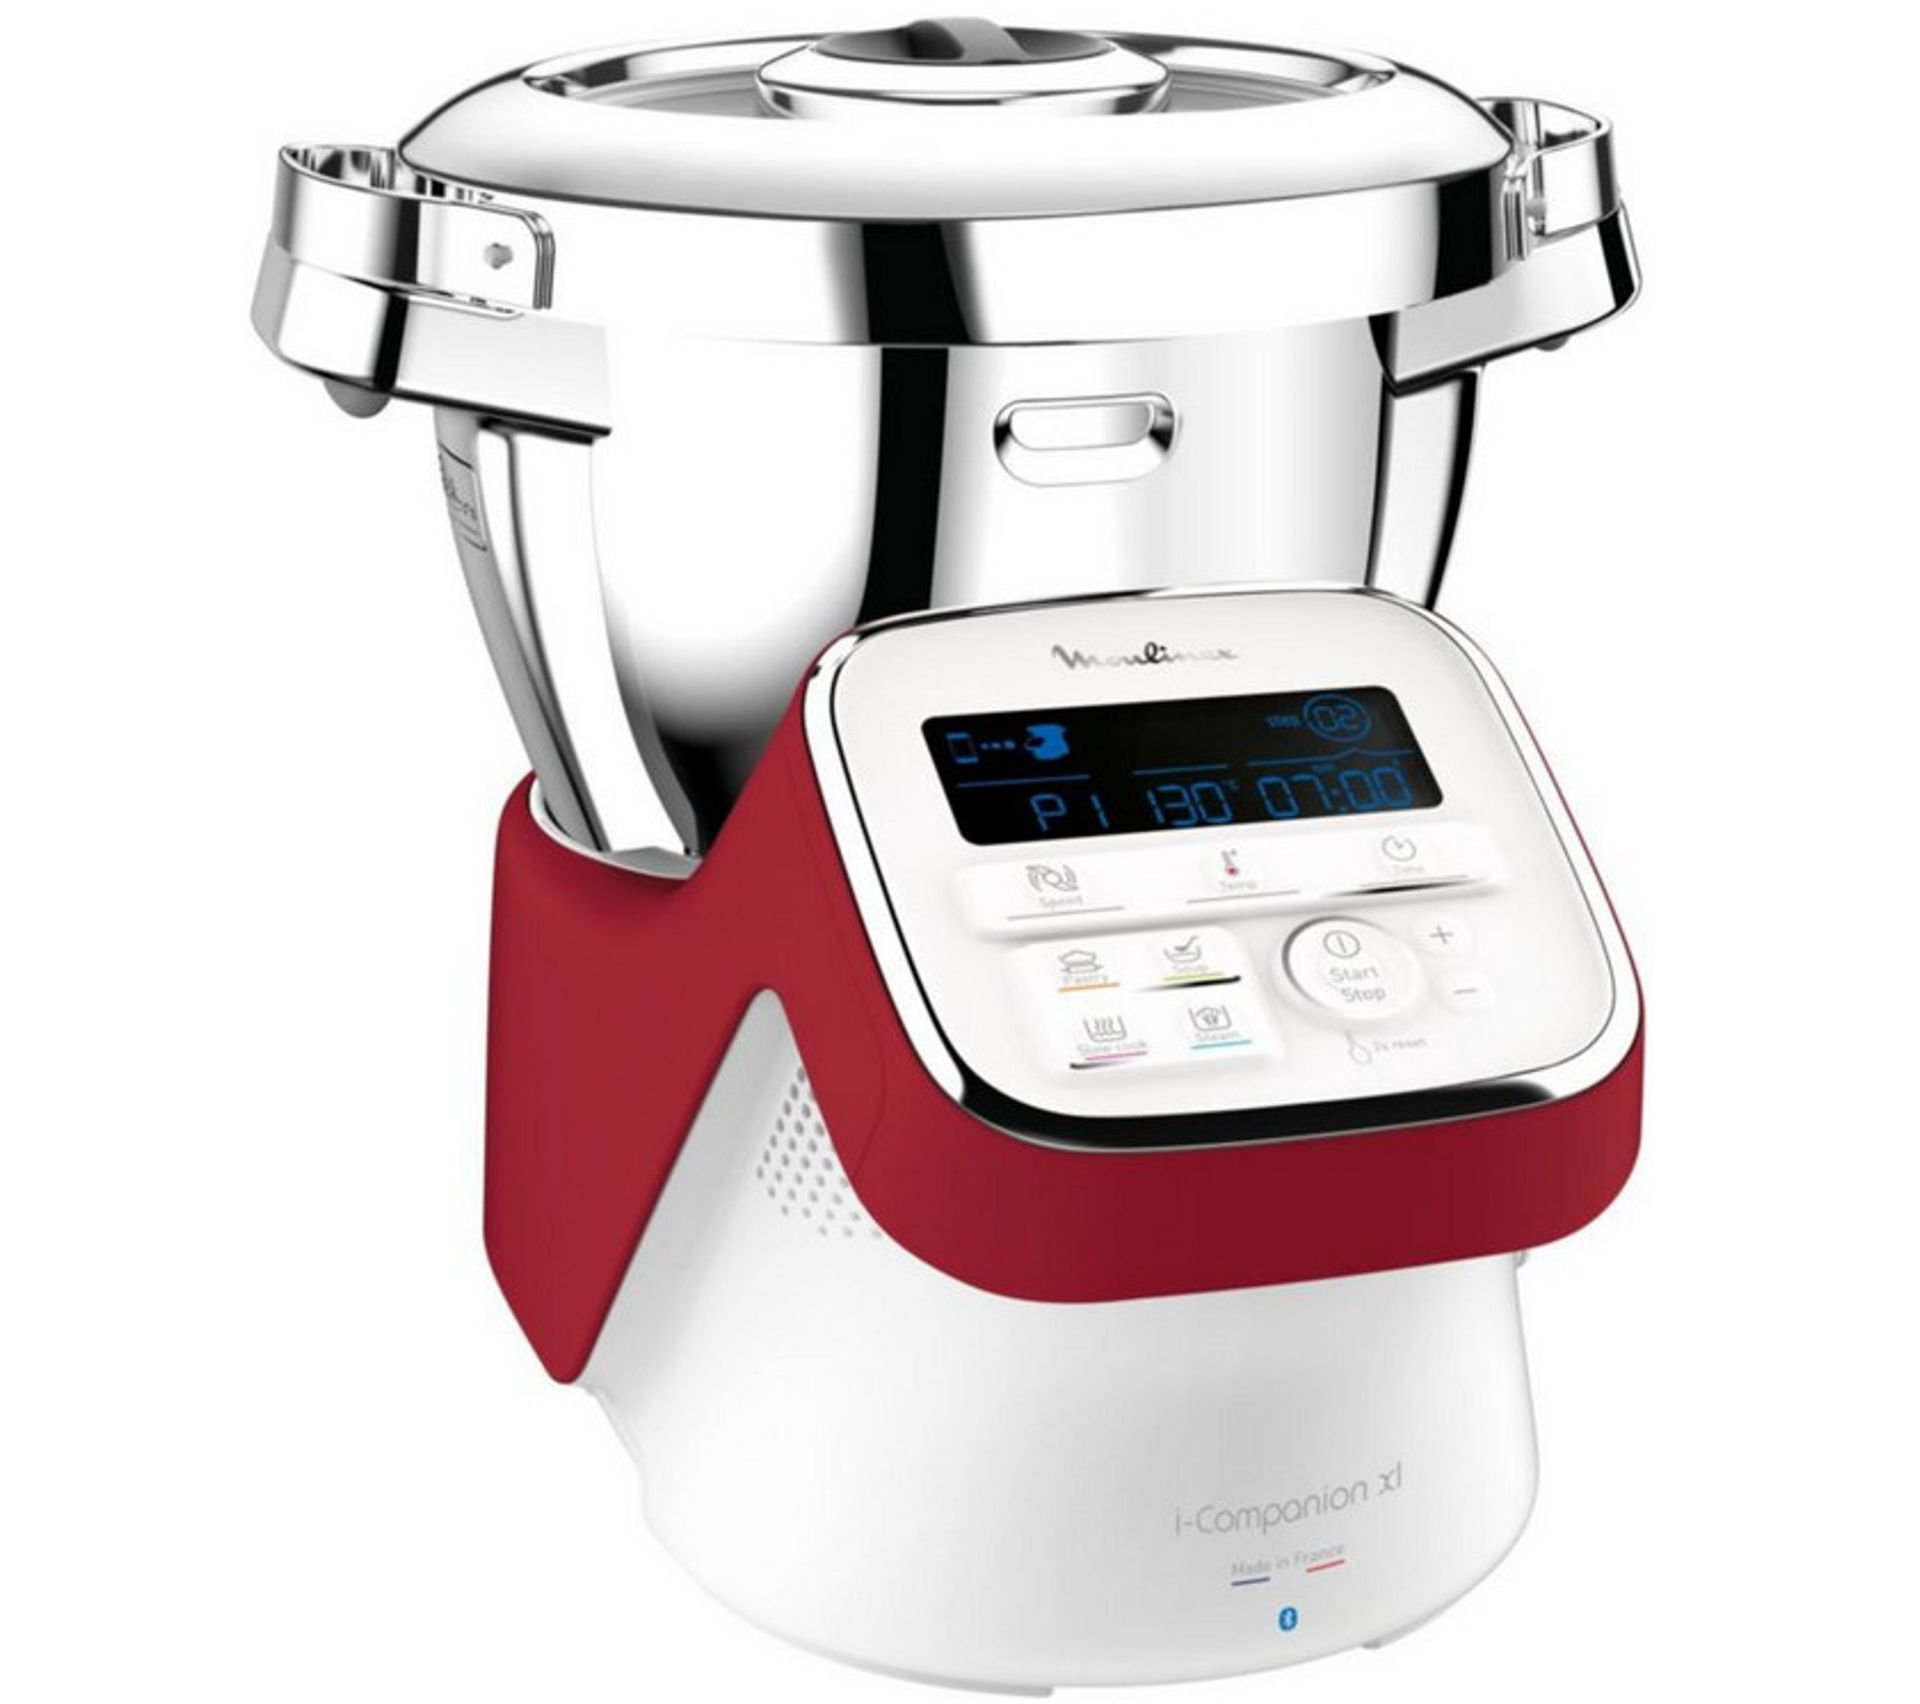 Bon Coin Robot Patissier robot cuiseur - connect i-companion xl hf908500